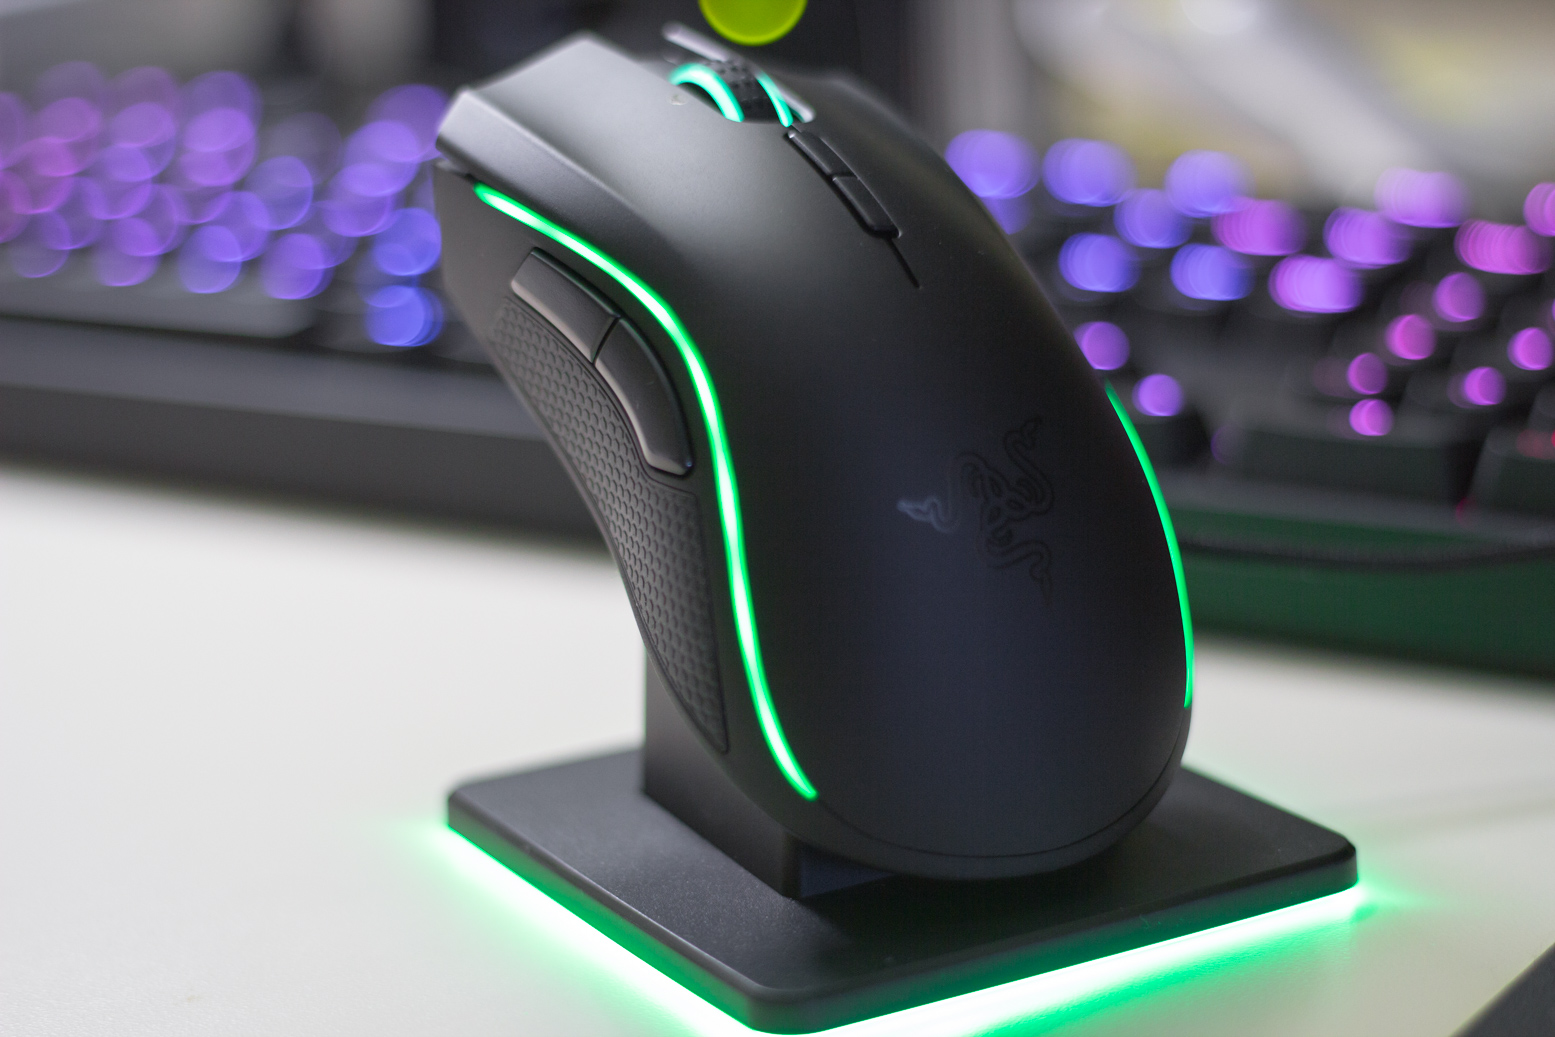 Razer Mamba Chroma Wireless Gaming Mouse Review | PC Gamer